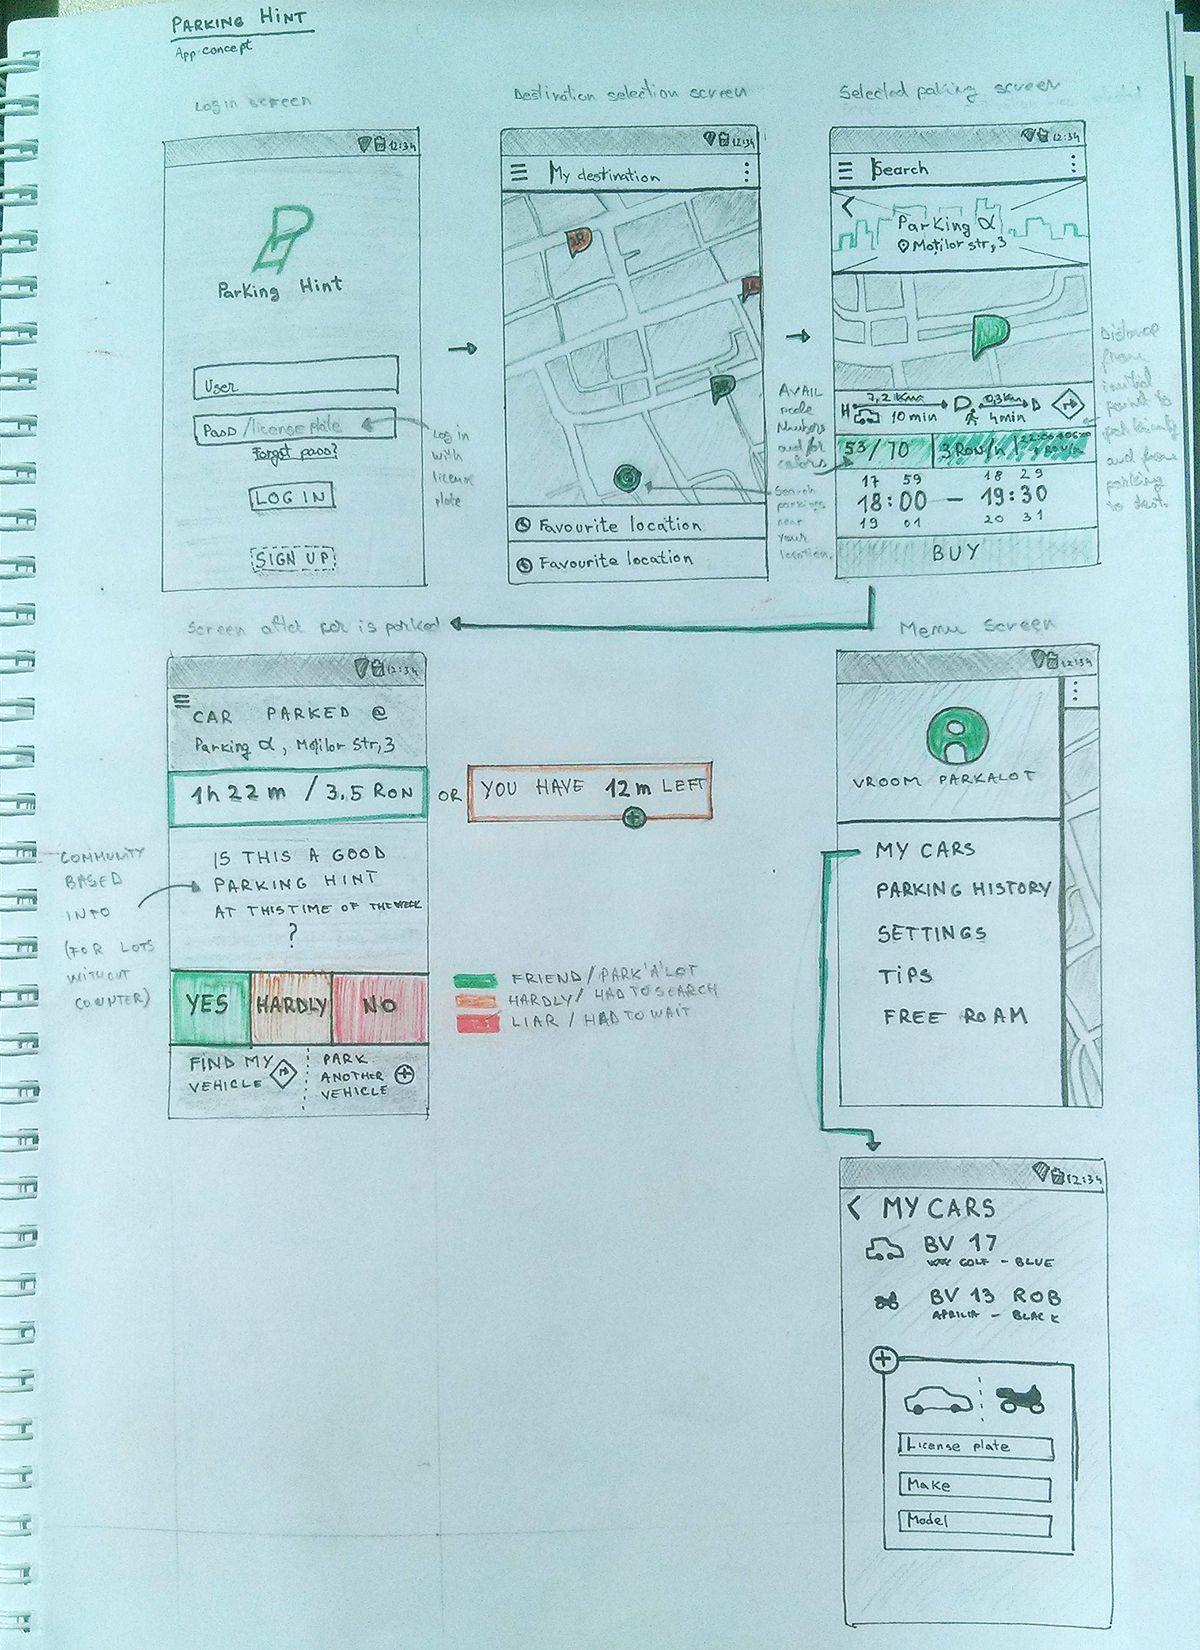 Community based parking app concept | parking apps | Pinterest | App